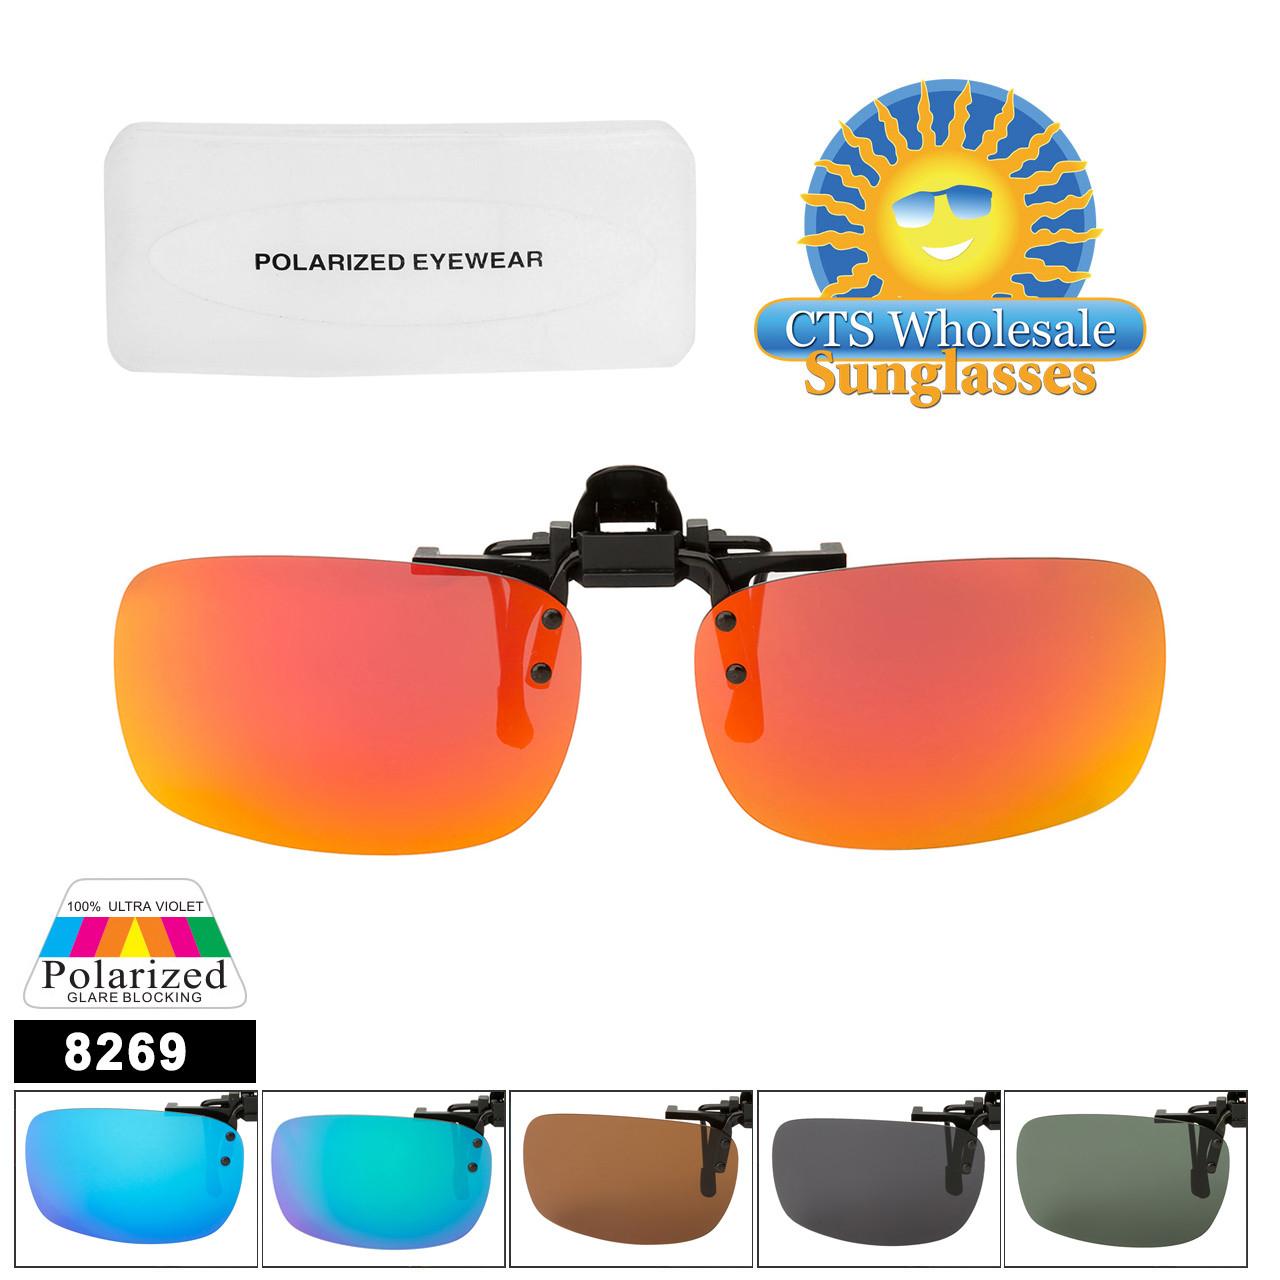 79c639baf8 Clip On Sunglasses Wholesale with Polarized Lens 8269